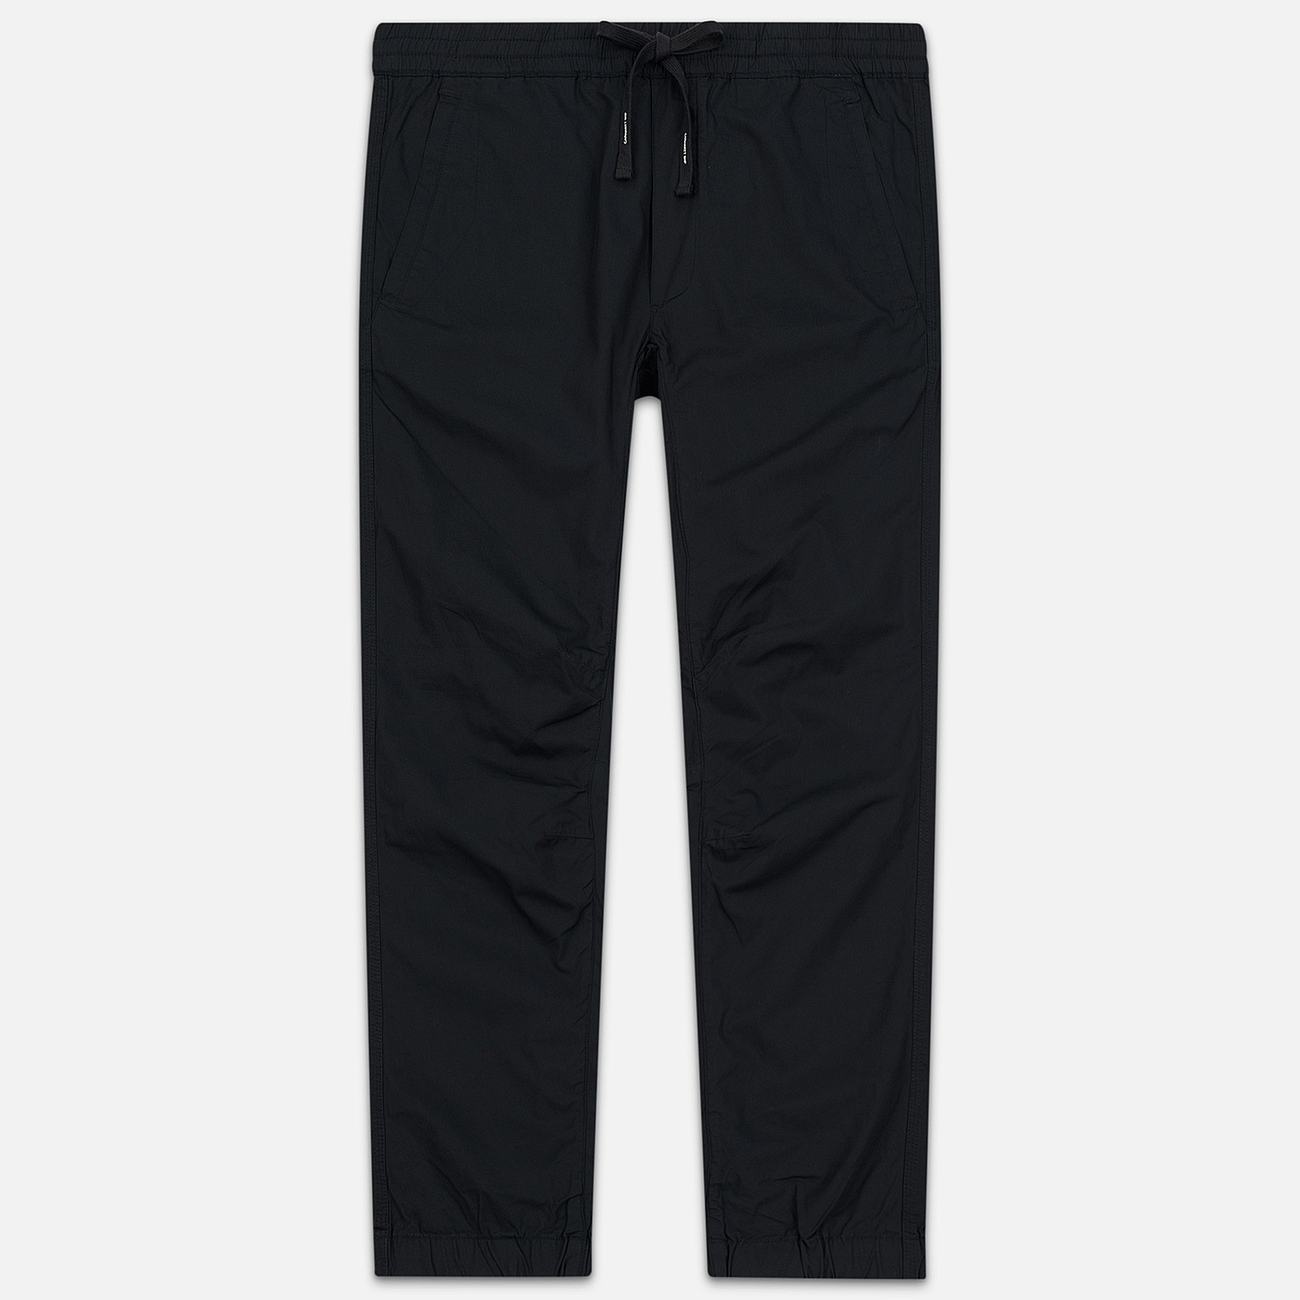 Мужские брюки Carhartt WIP Coleman 4.4 Oz Black/Wax